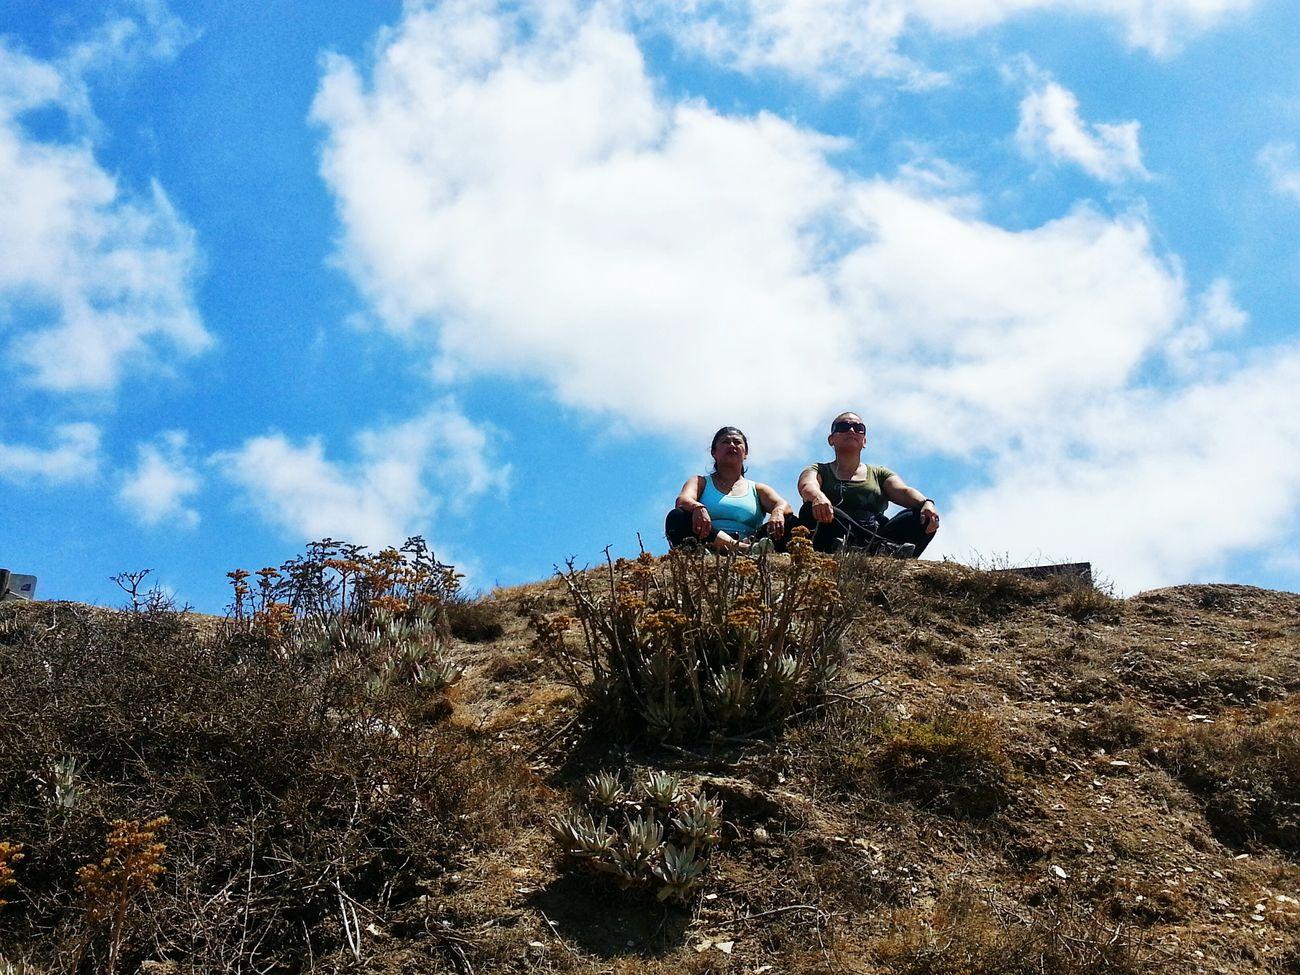 Morninghike R&R Time! Meditation Deepbreathing Oceanview Trails